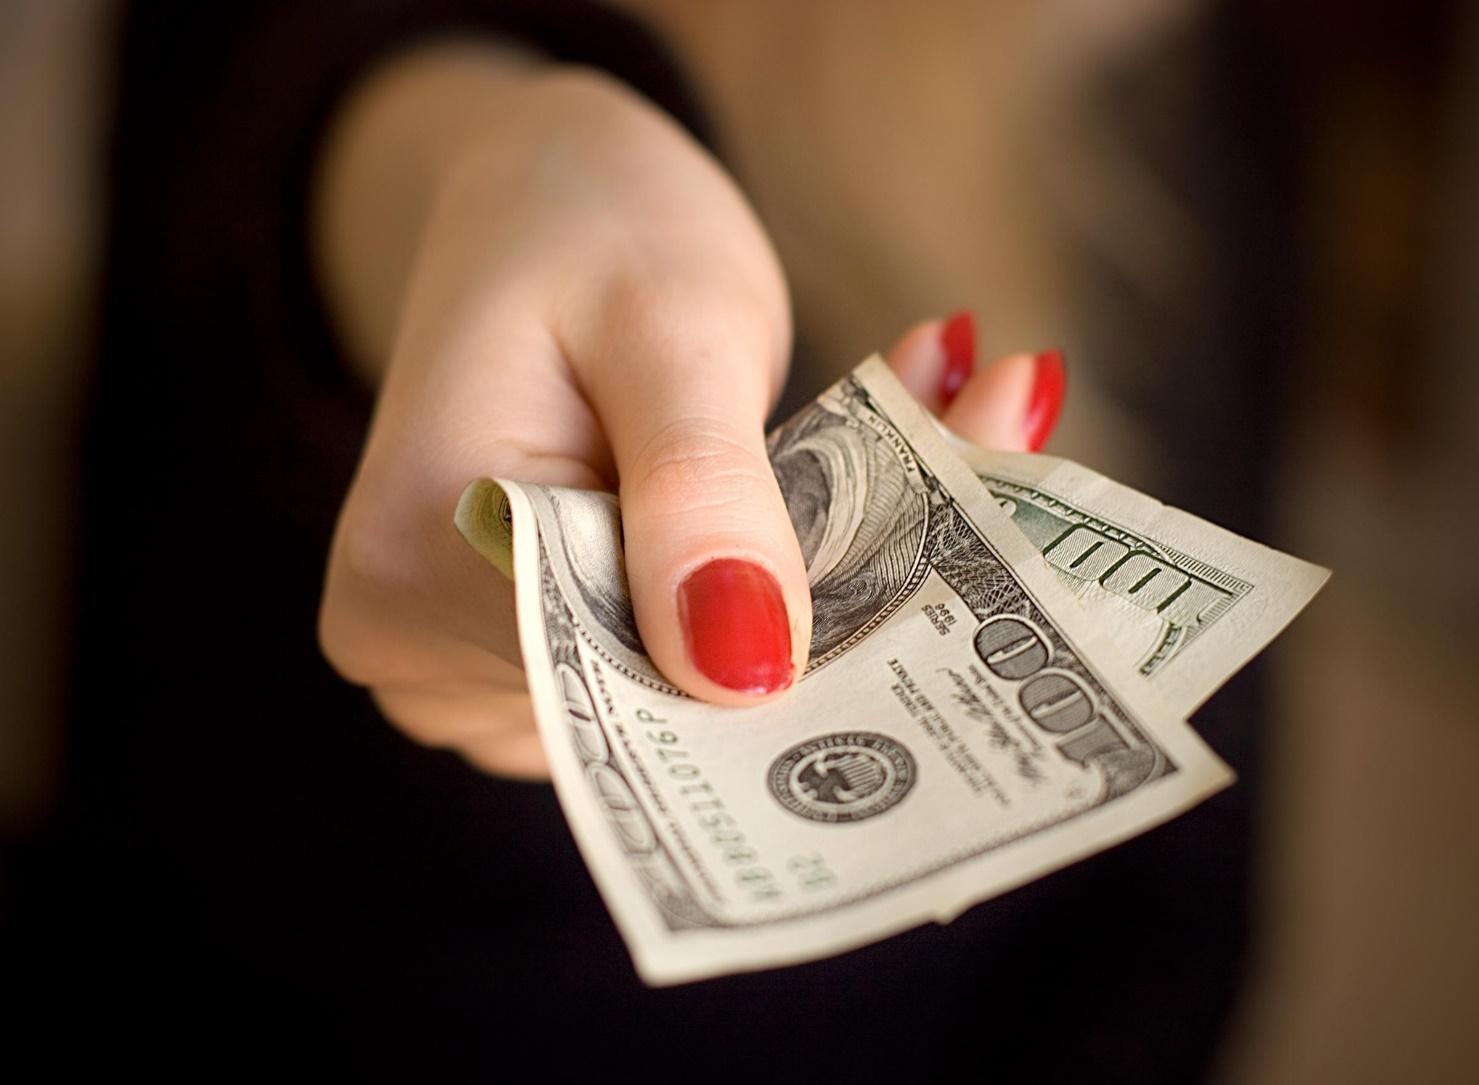 banii pot fi câștigați cu ușurință